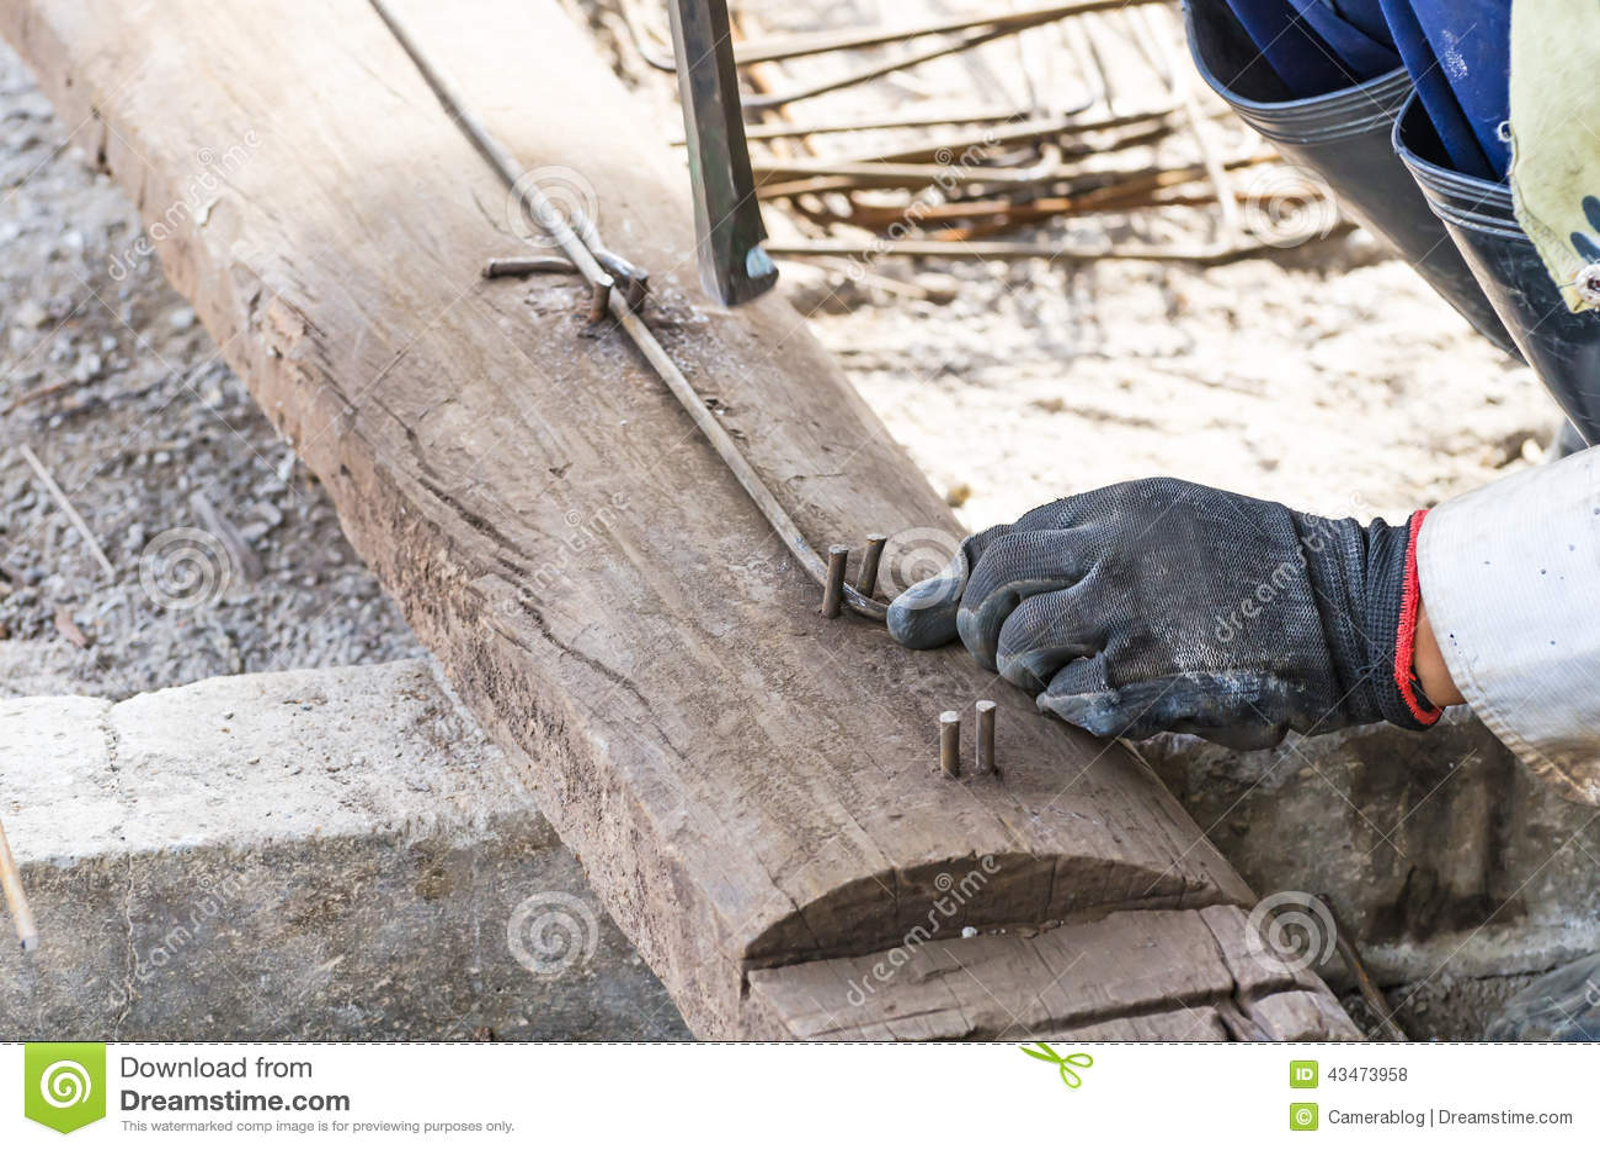 rebar bending by worker in construction site rebar worker